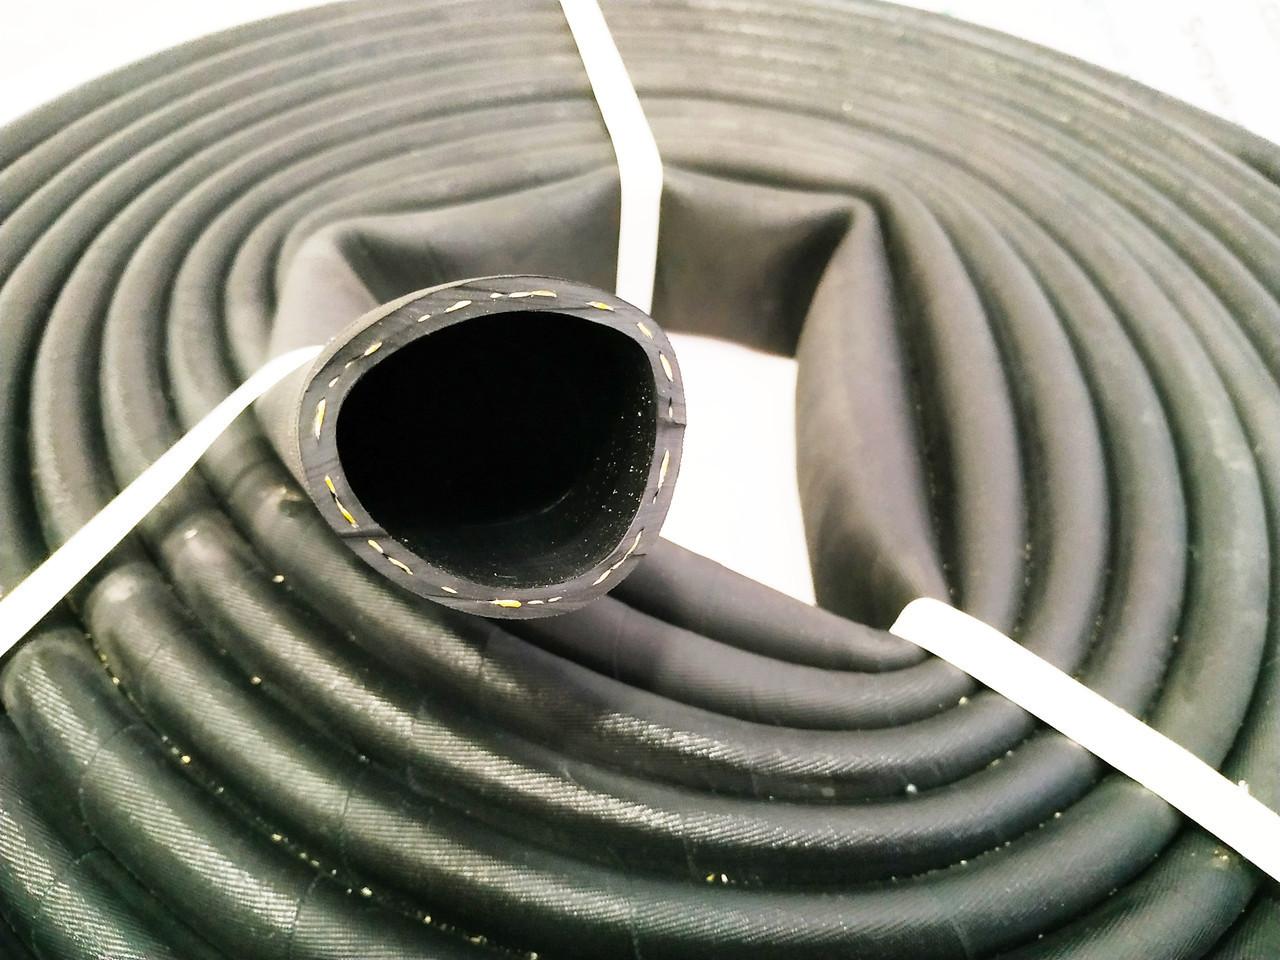 Напорный рукав Ø18 мм. 20м бухта.Высокого давления.Дорновый. ВГ(ІІІ)(техническая вода)Билпромрукав.